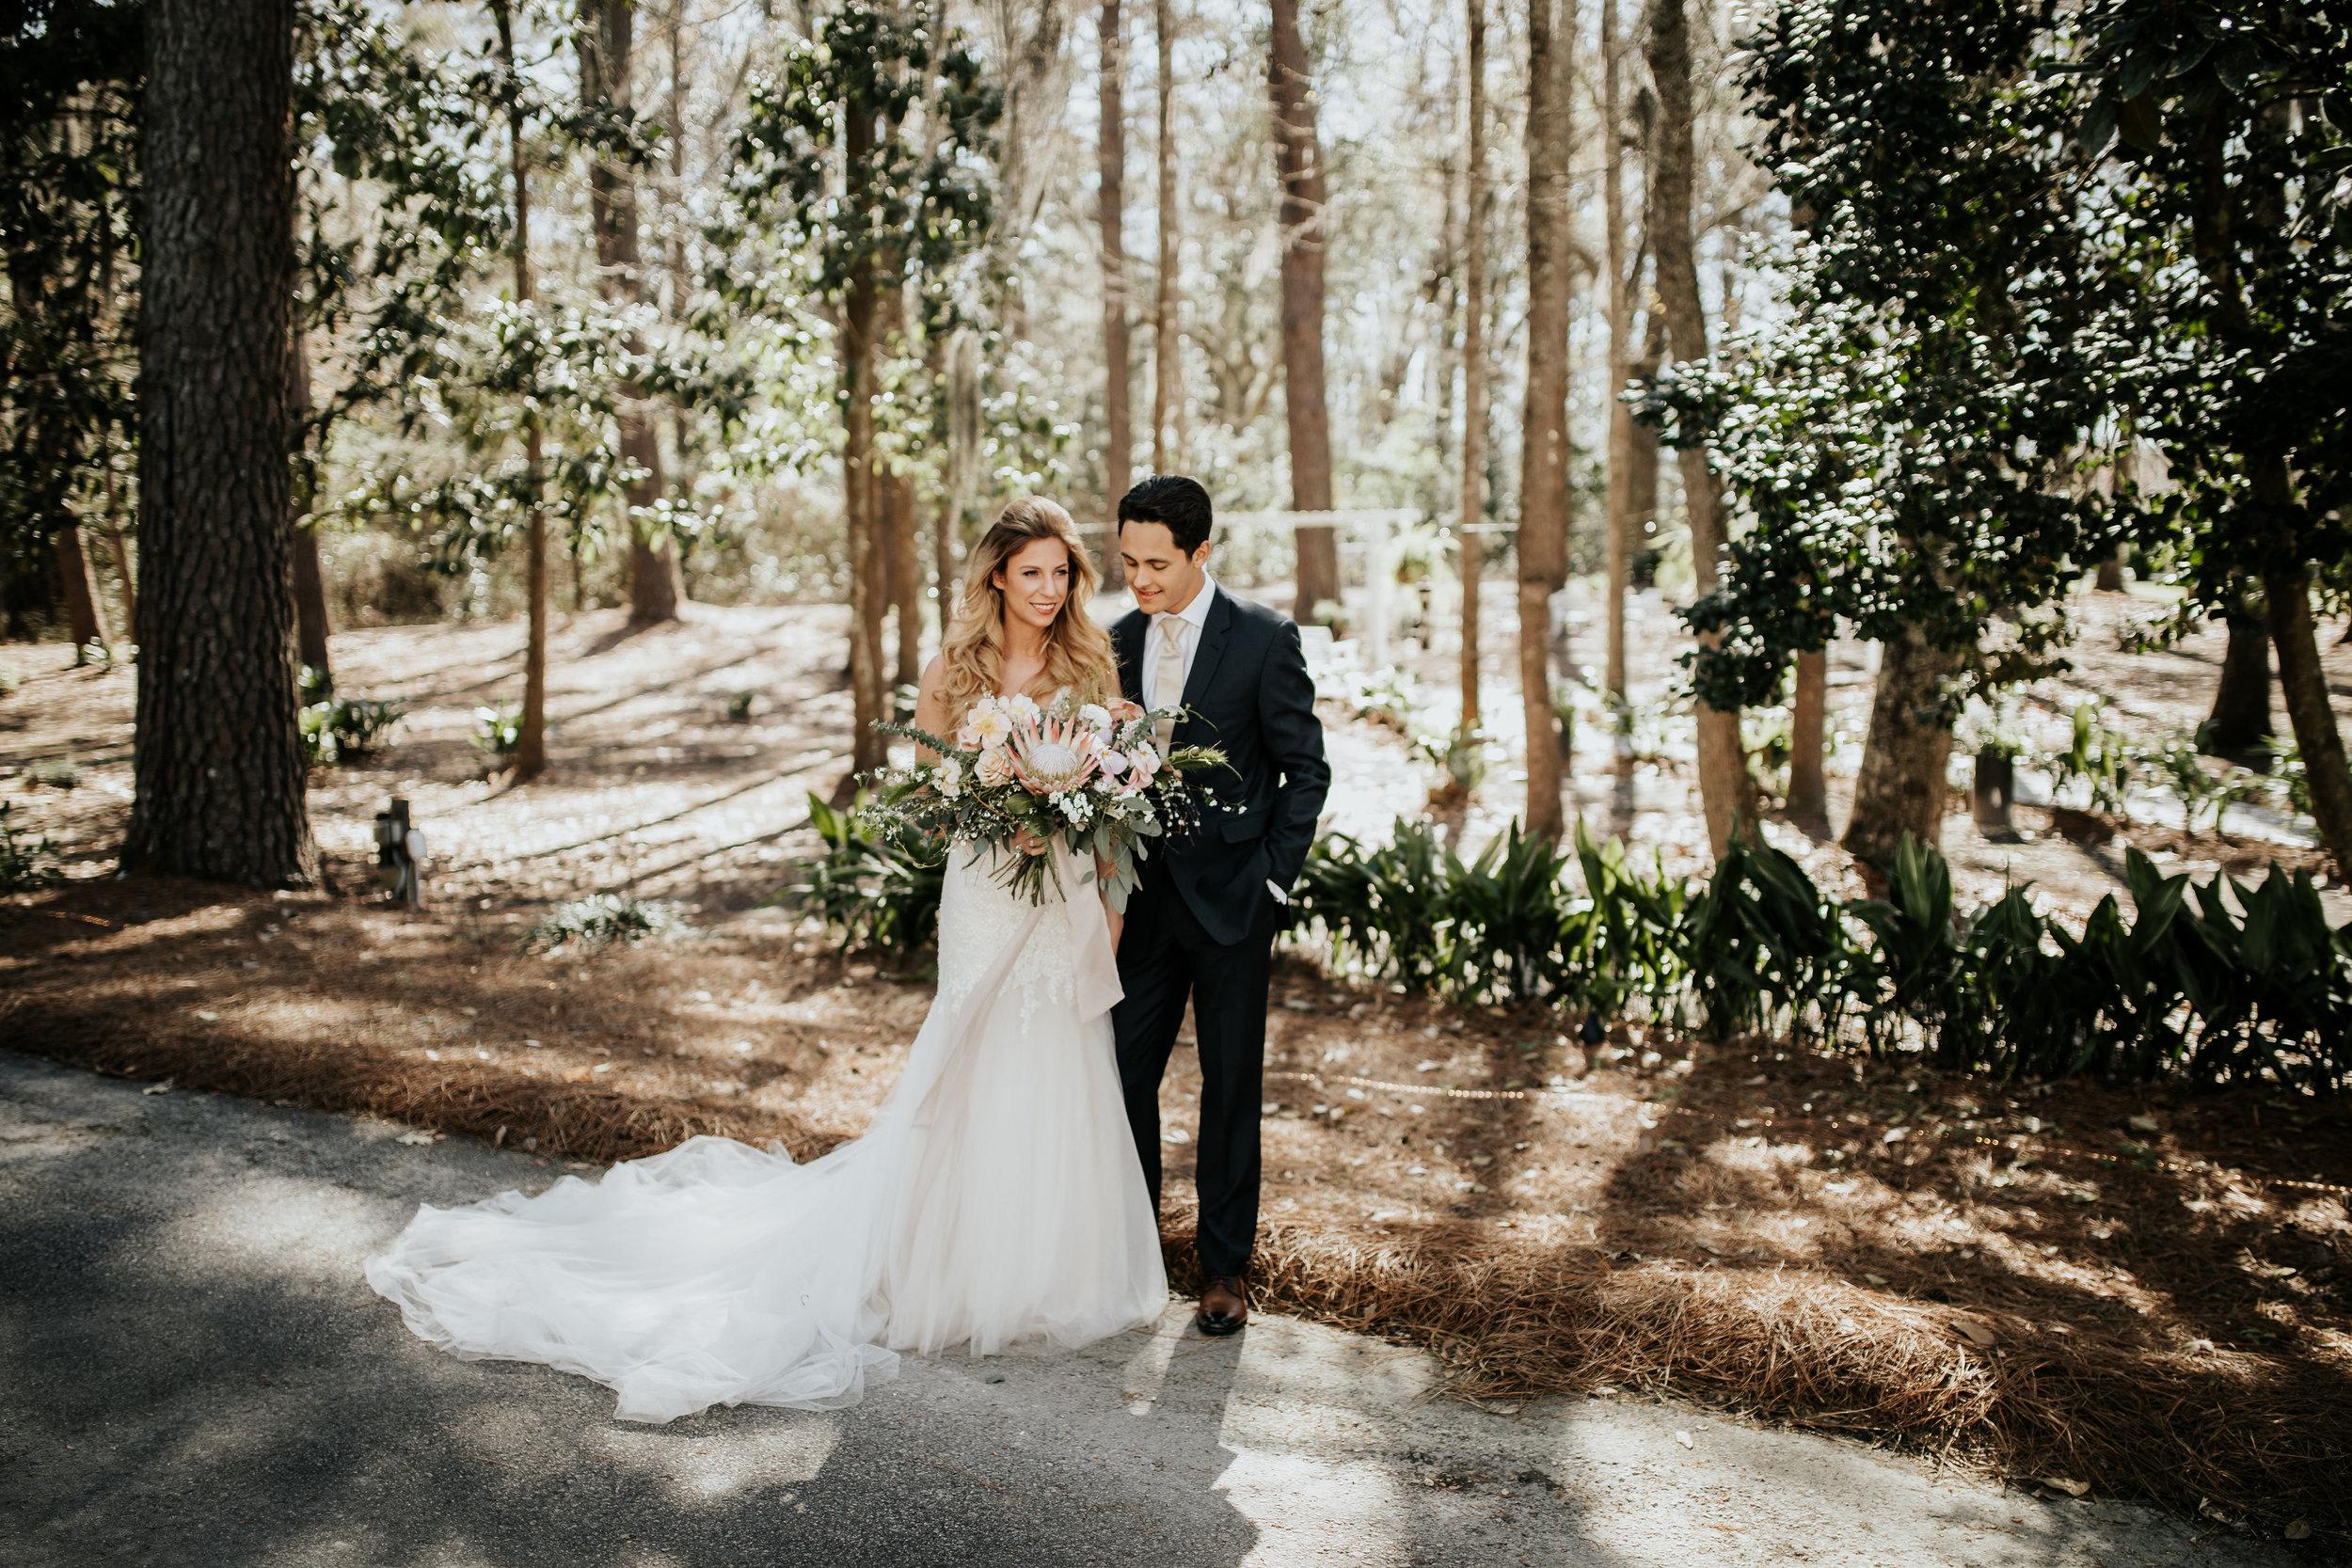 ivory-and-beau-blog-mackey-house-styled-shoot-savannah-wedding-bridal-boutique-savannah-florist-southern-wedding-_G5A1674.jpg